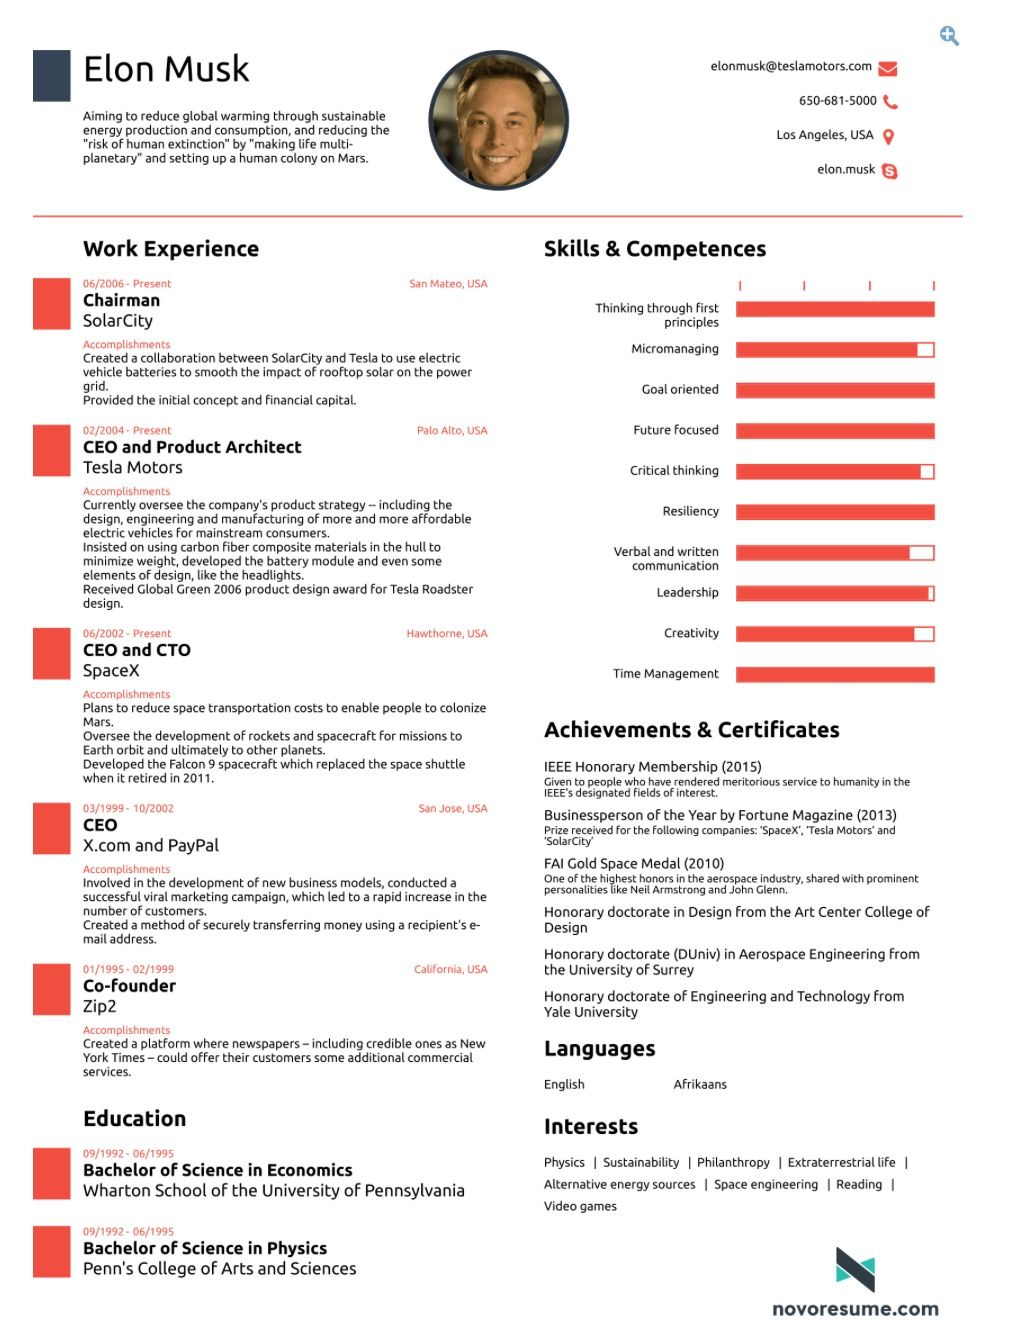 Elon Musk Resume Infographic Cv Elon Musk